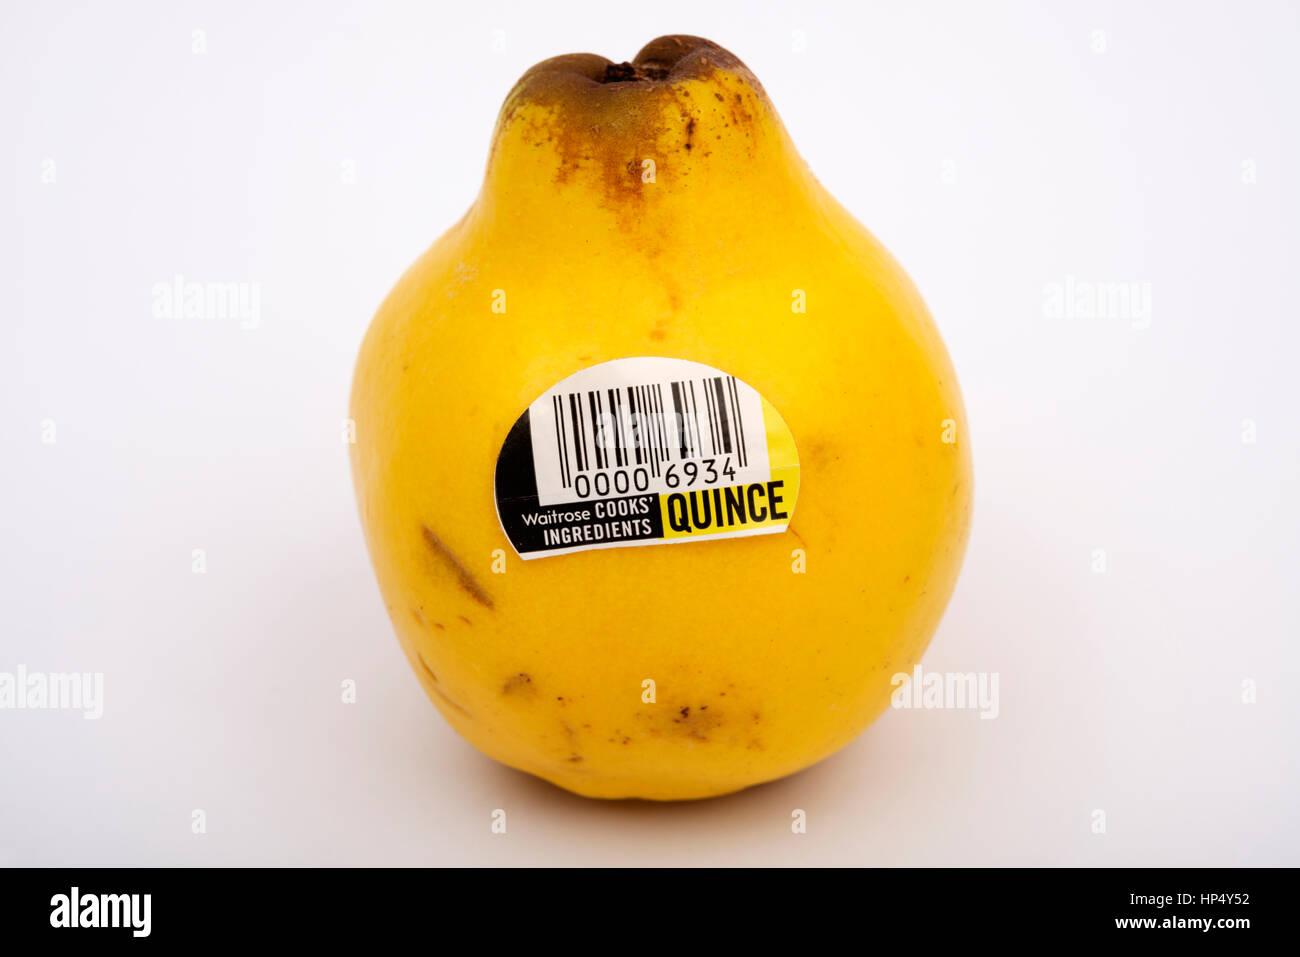 Waitrose cook's ingredients Quince - Stock Image